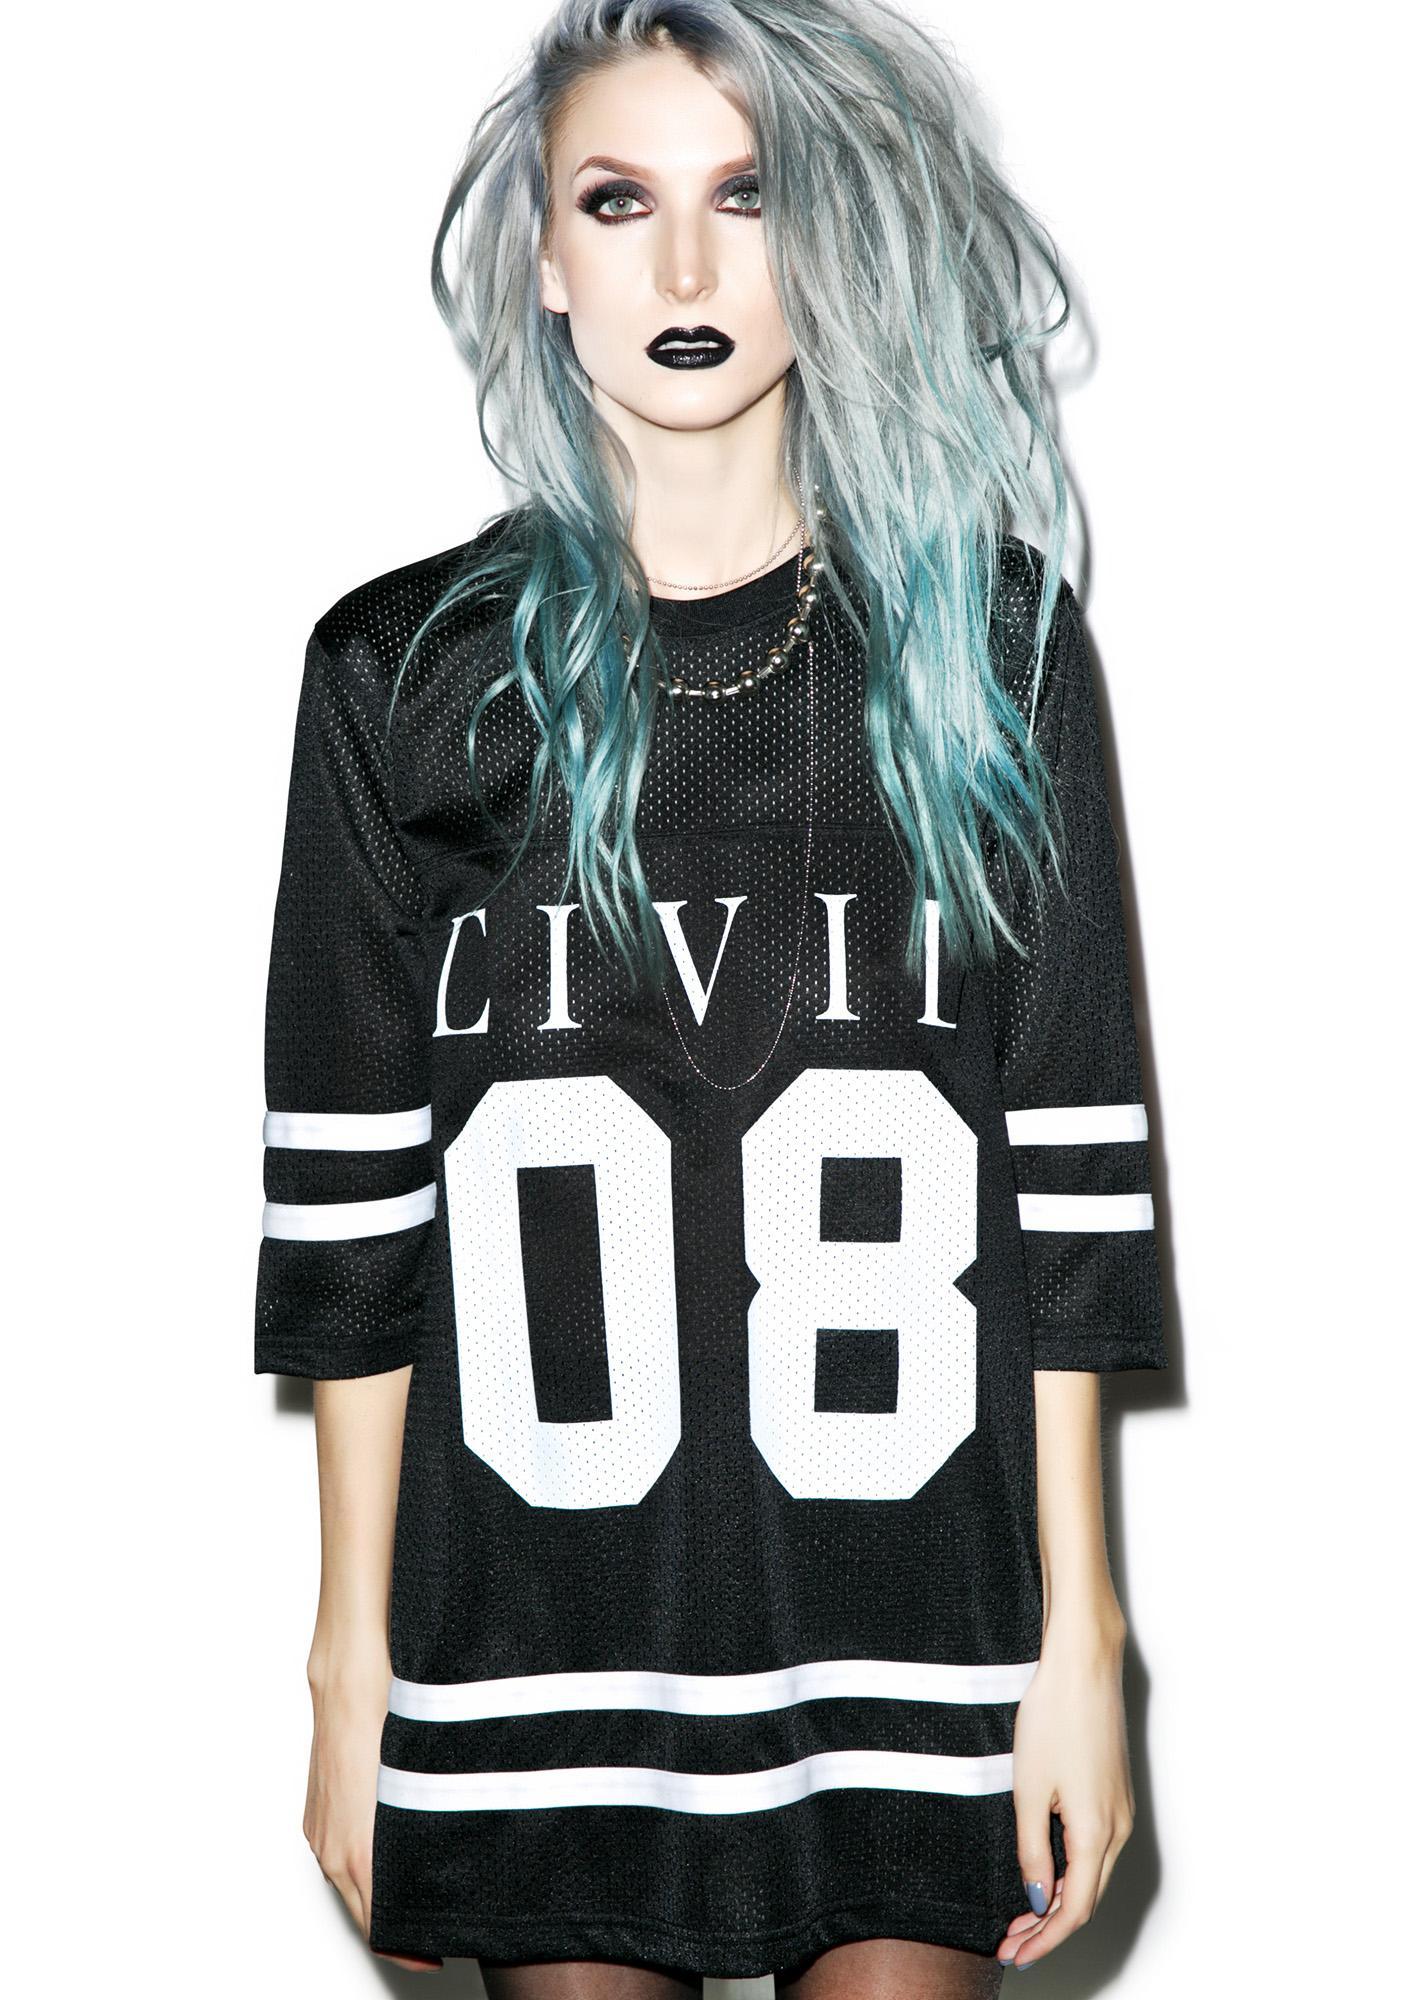 Civil Clothing Civil 08 Mesh Jersey Dress